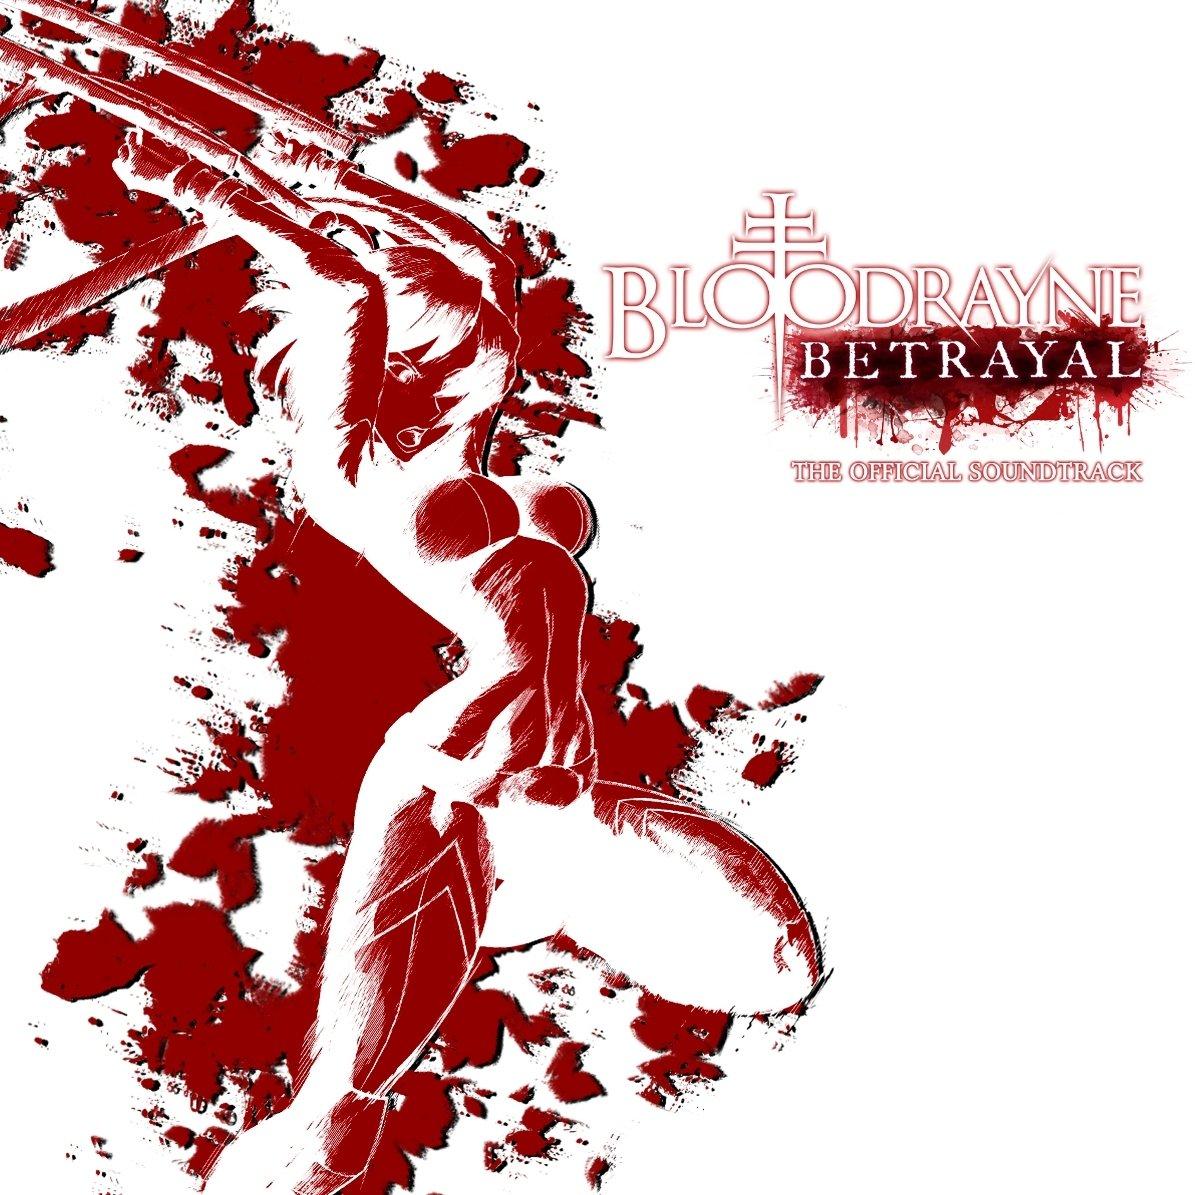 Bloodrayne Betrayal Art Id 37449 Art Abyss